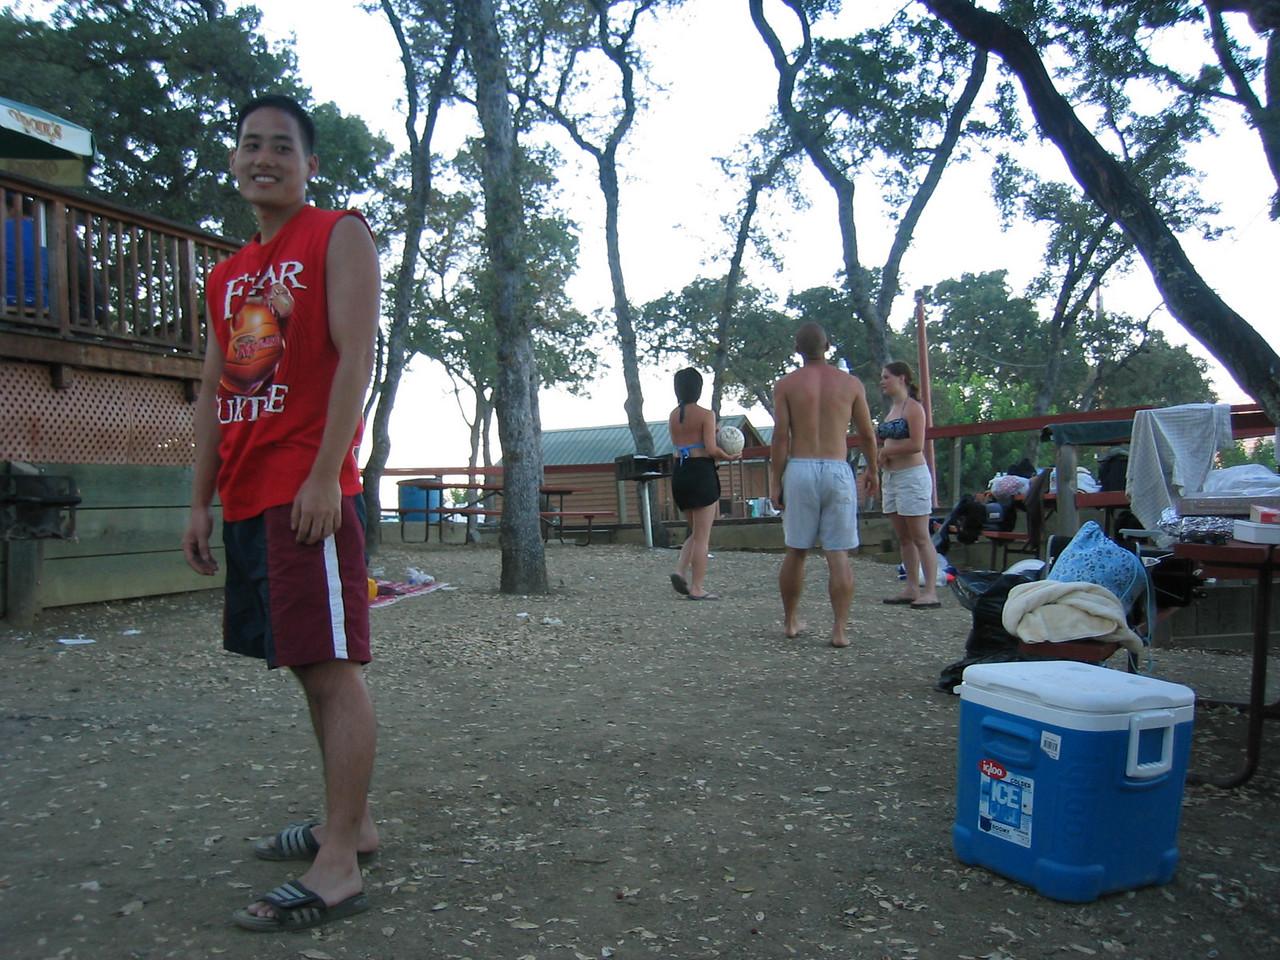 2003 08 16 Saturday - Lake Berryessa Trip,  Jimmy Chen, Chang siblings